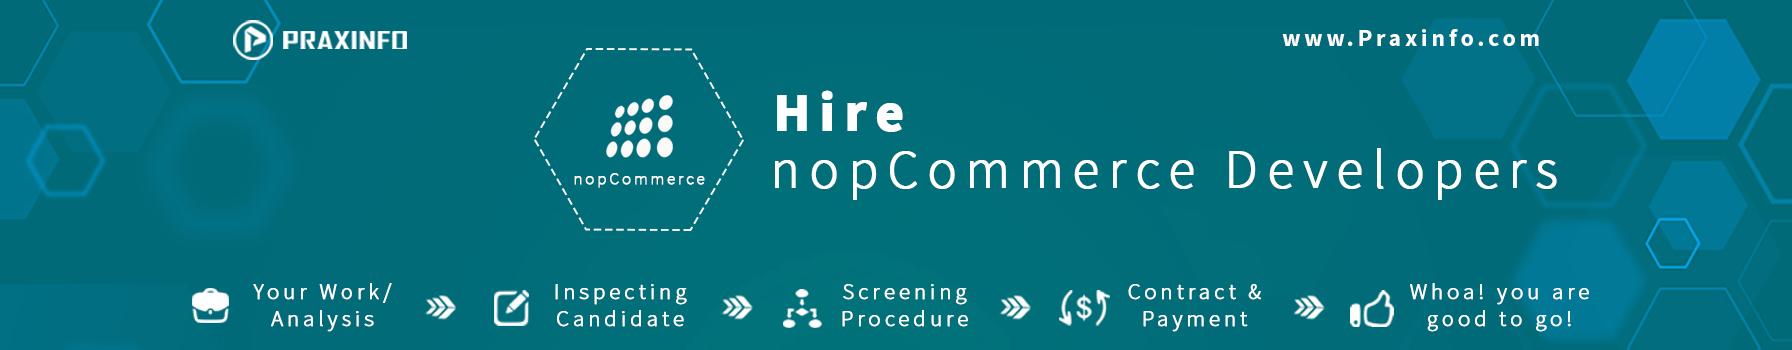 hire-nopCommerce-developer.png